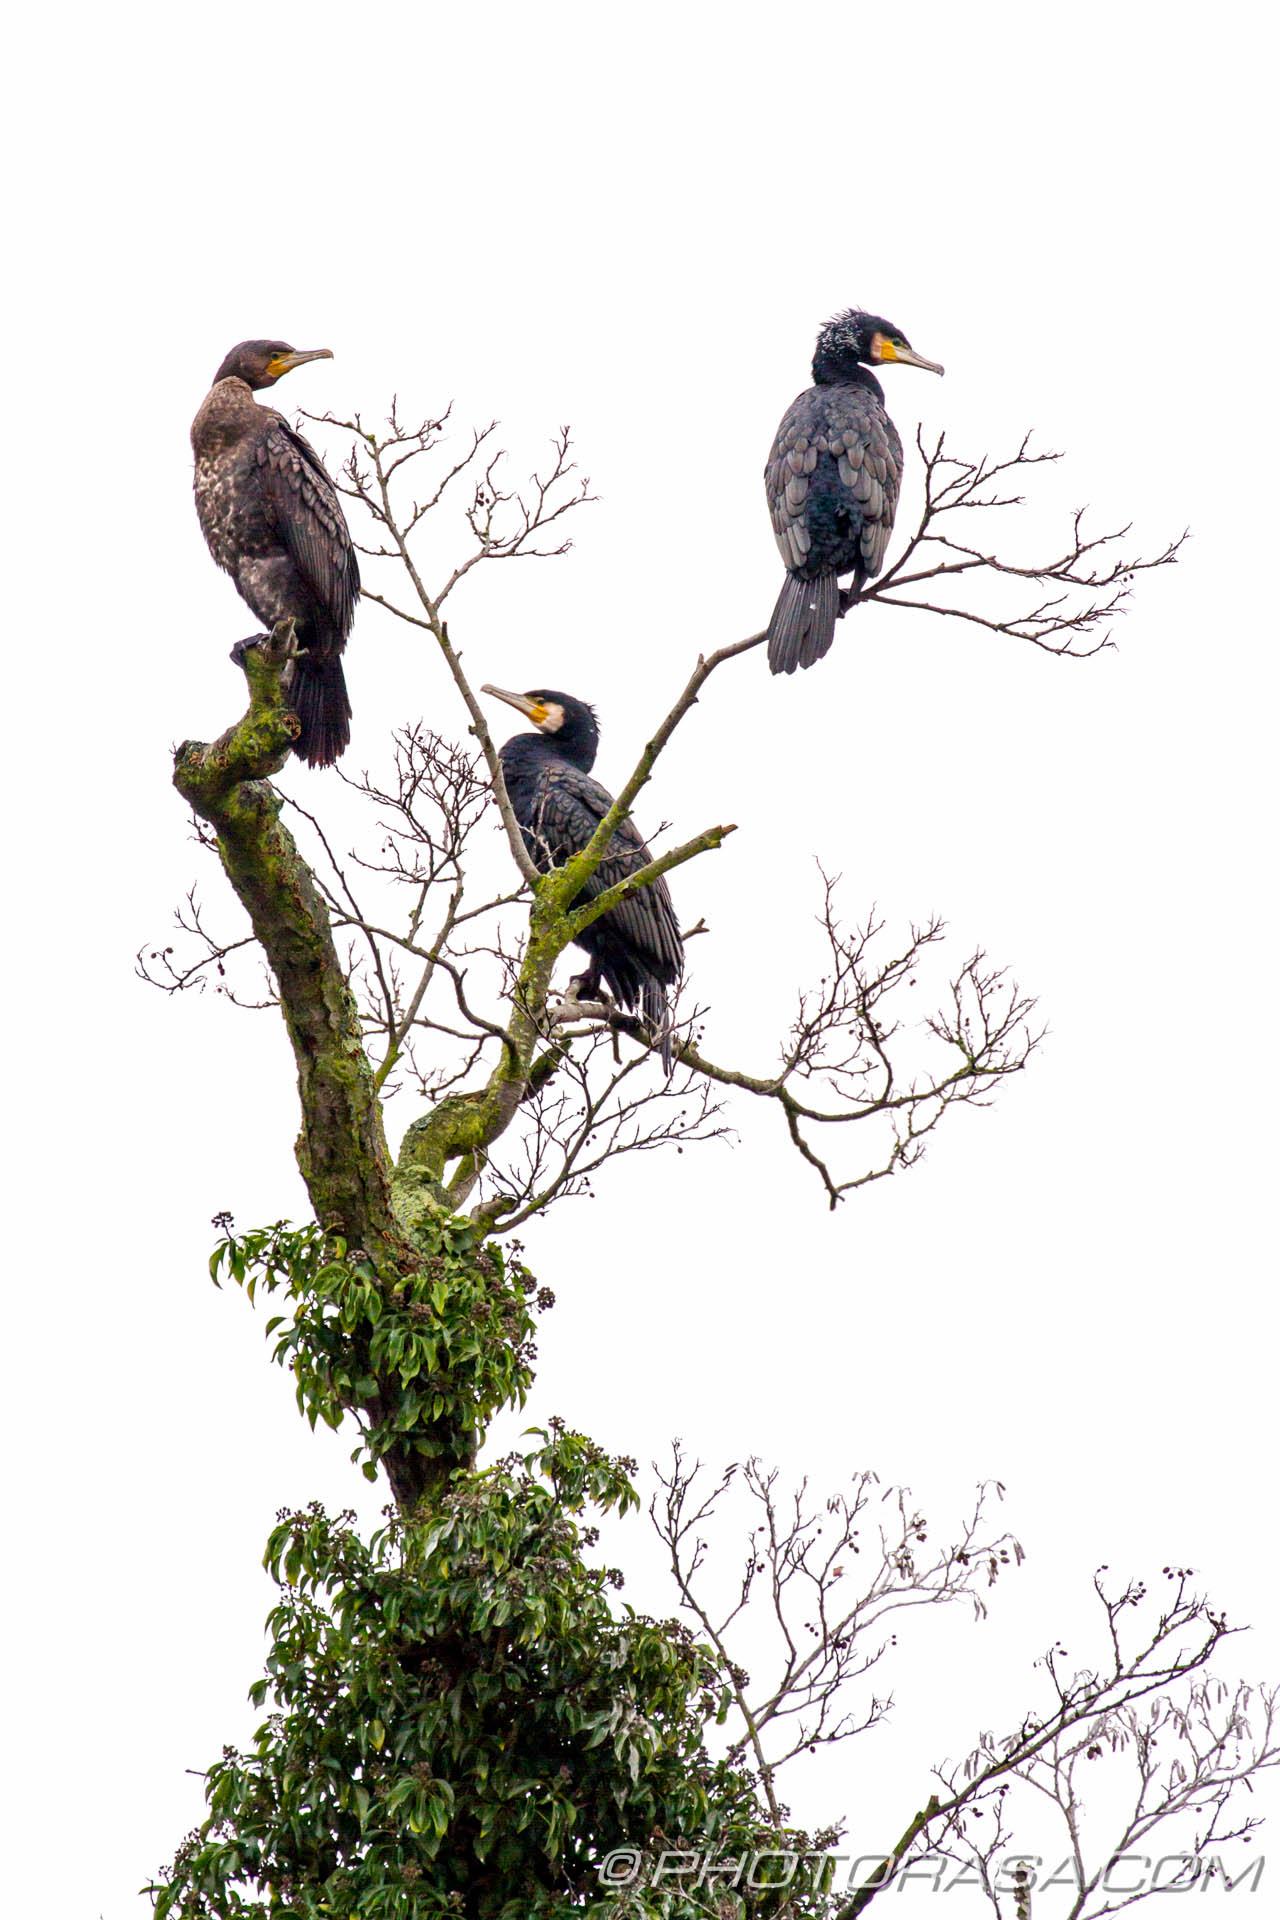 Three Black Cormorants - Photorasa Free HD Photos